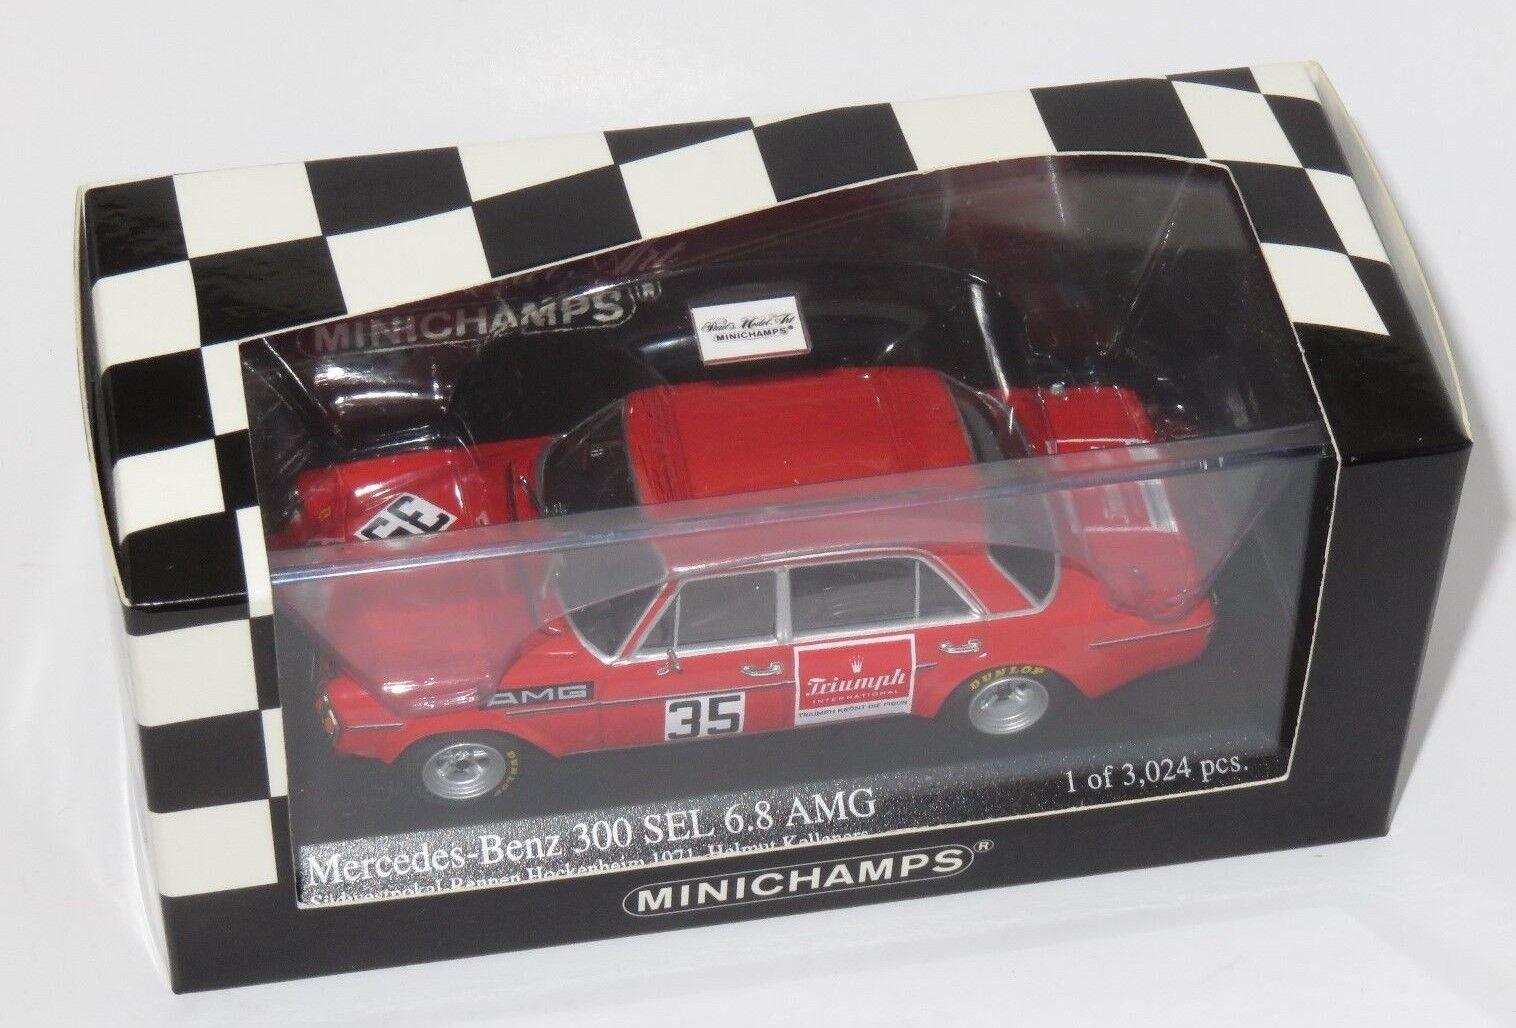 1/43 Mercedes Benz 300 SEL 6.8 AMG Hockenheim 1971 H. Kelleners | Porter-résistance